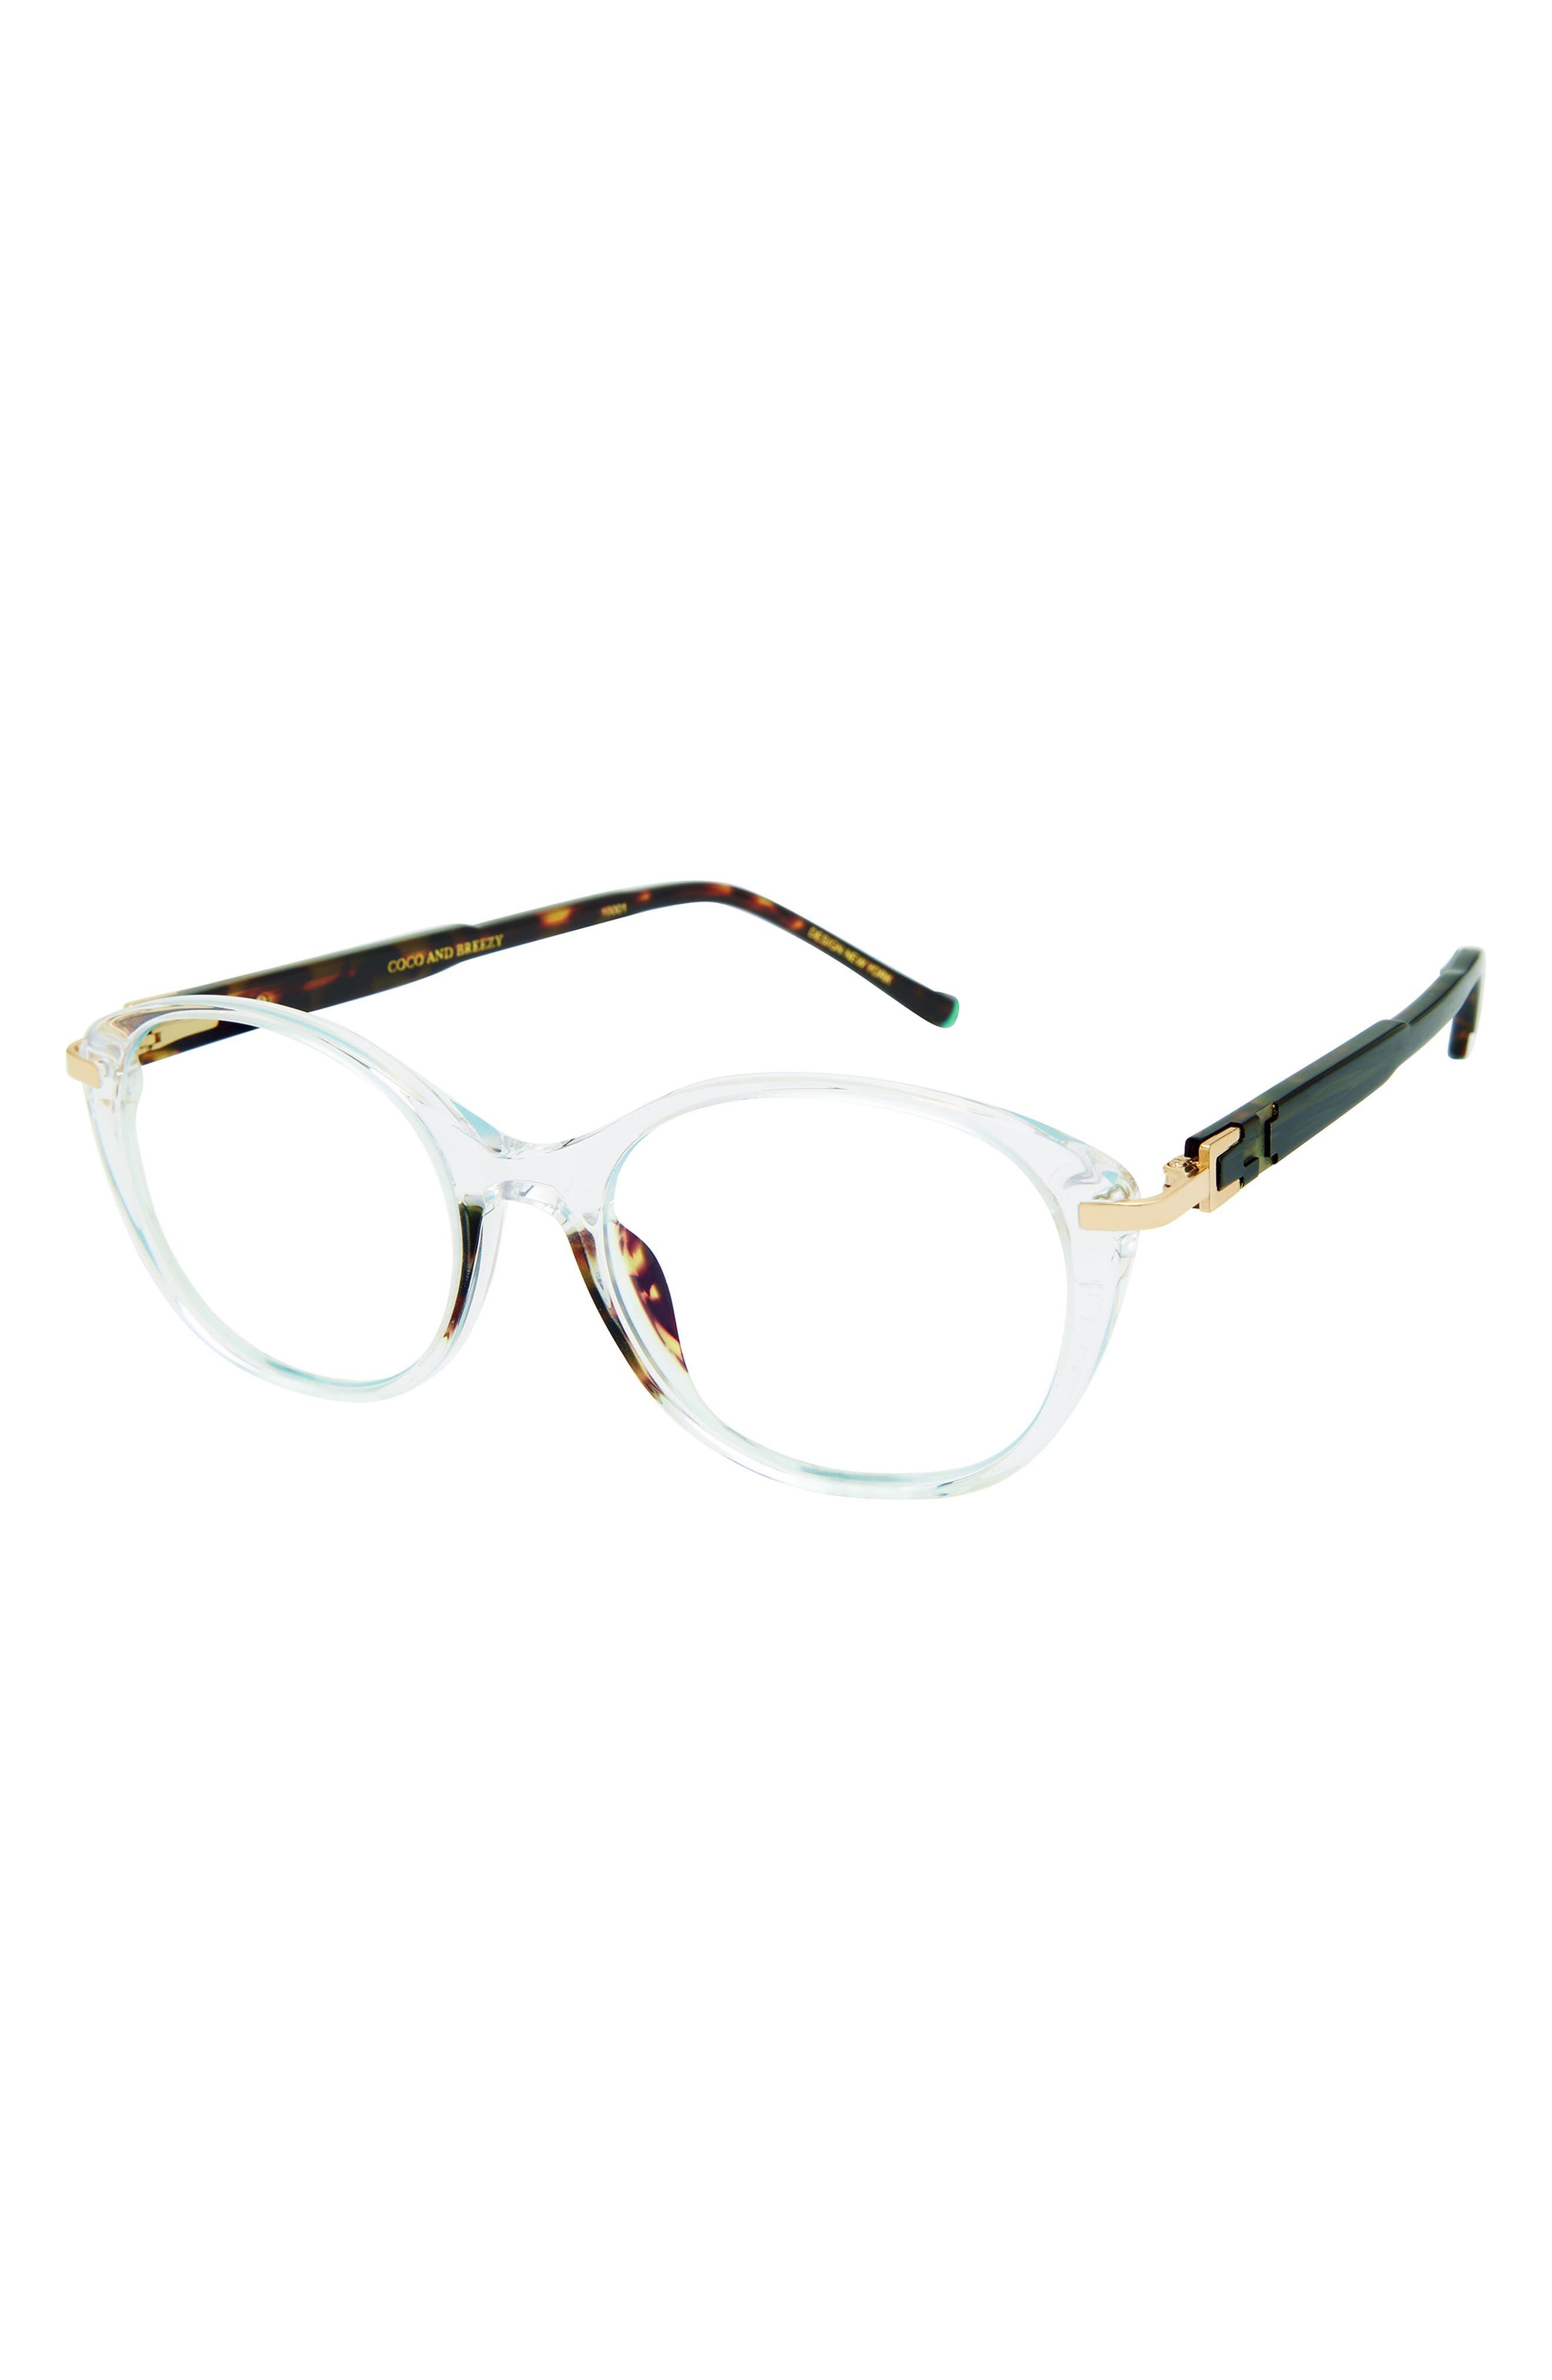 Healing 51mm Round Blue Light Filtering Glasses